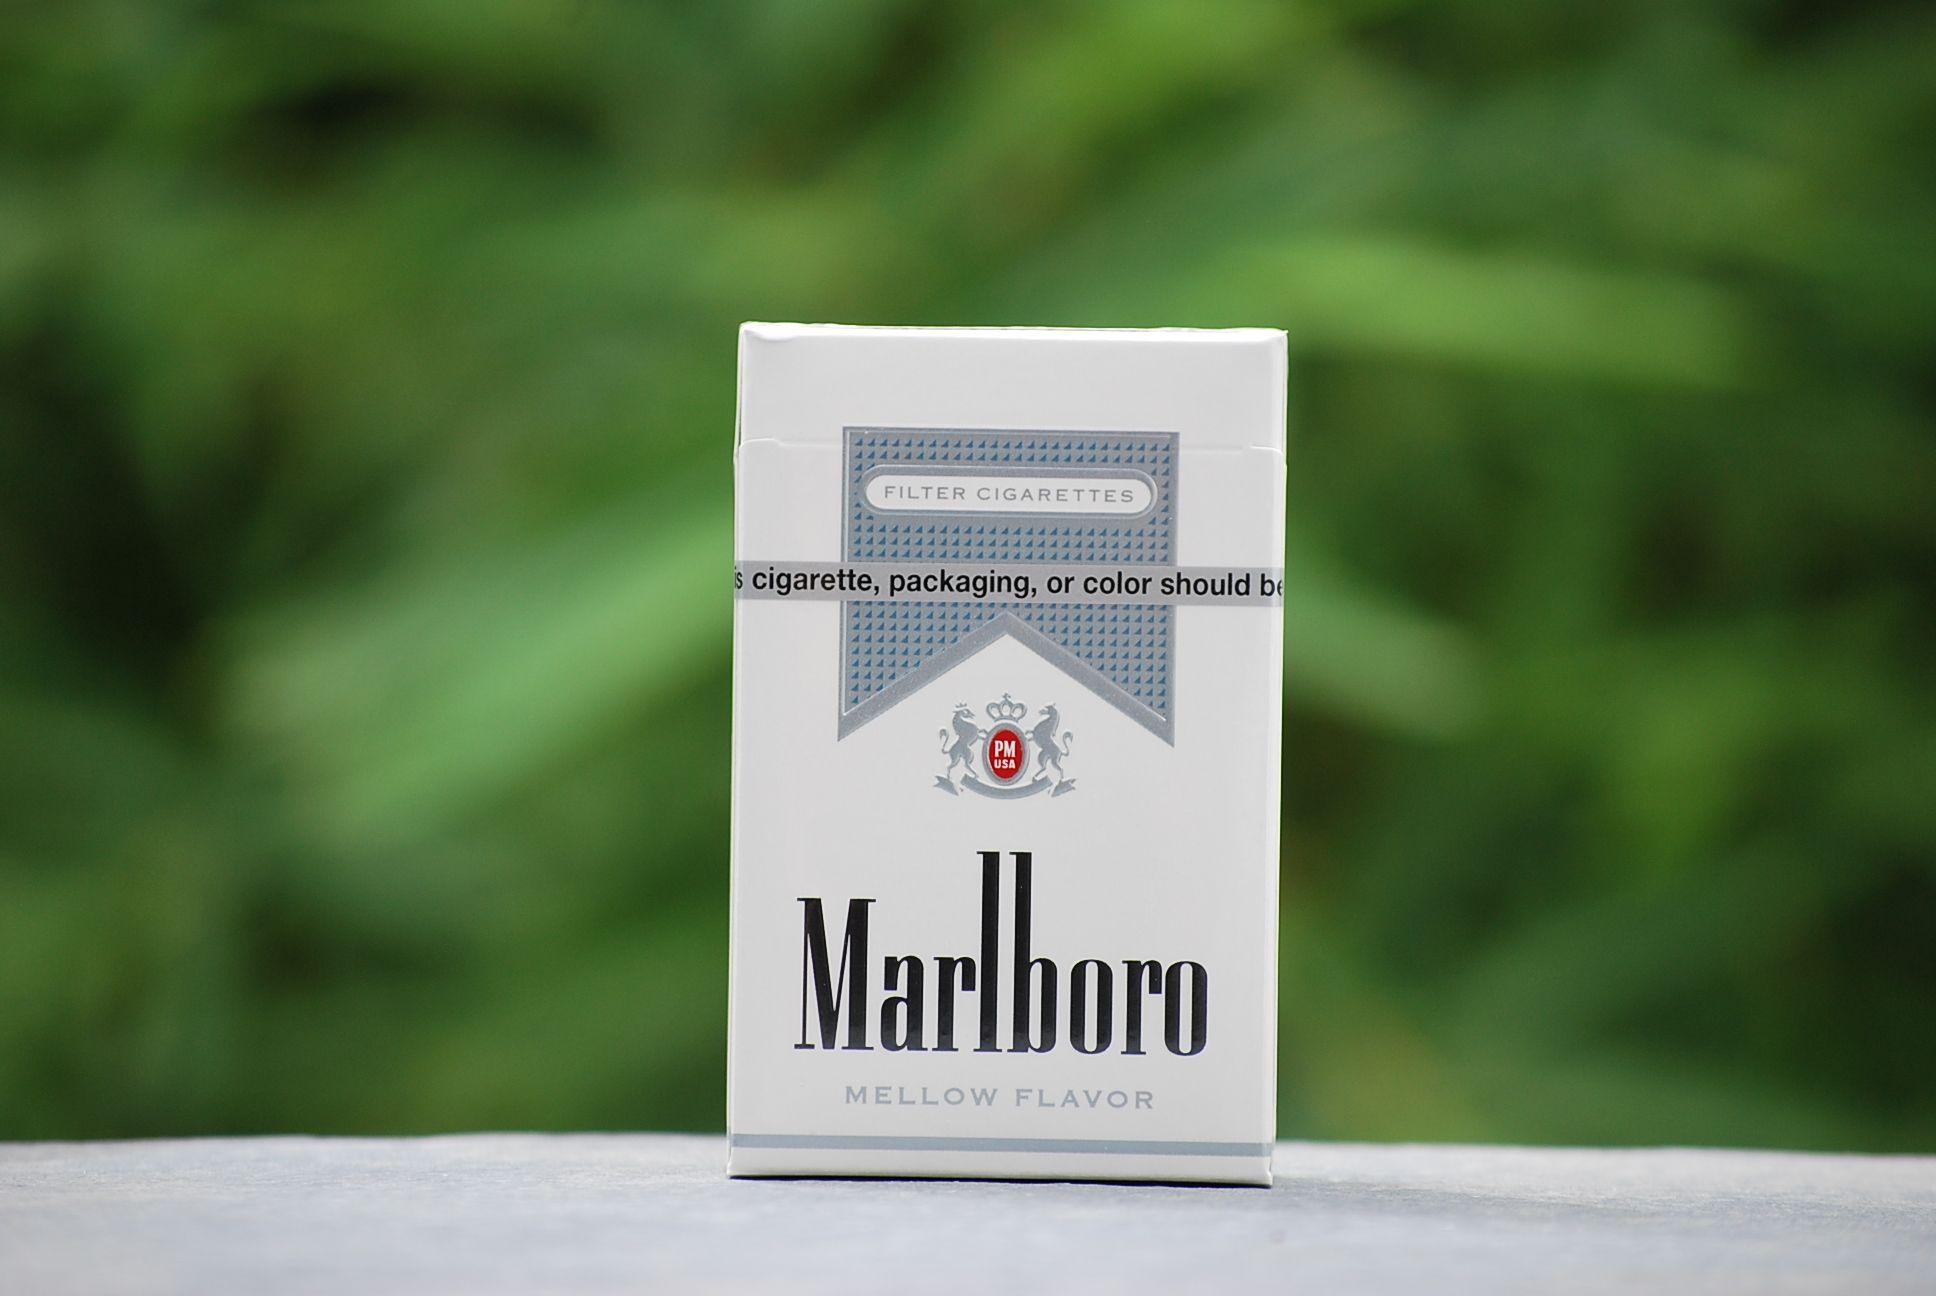 Buy Marlboro cigarette london shop